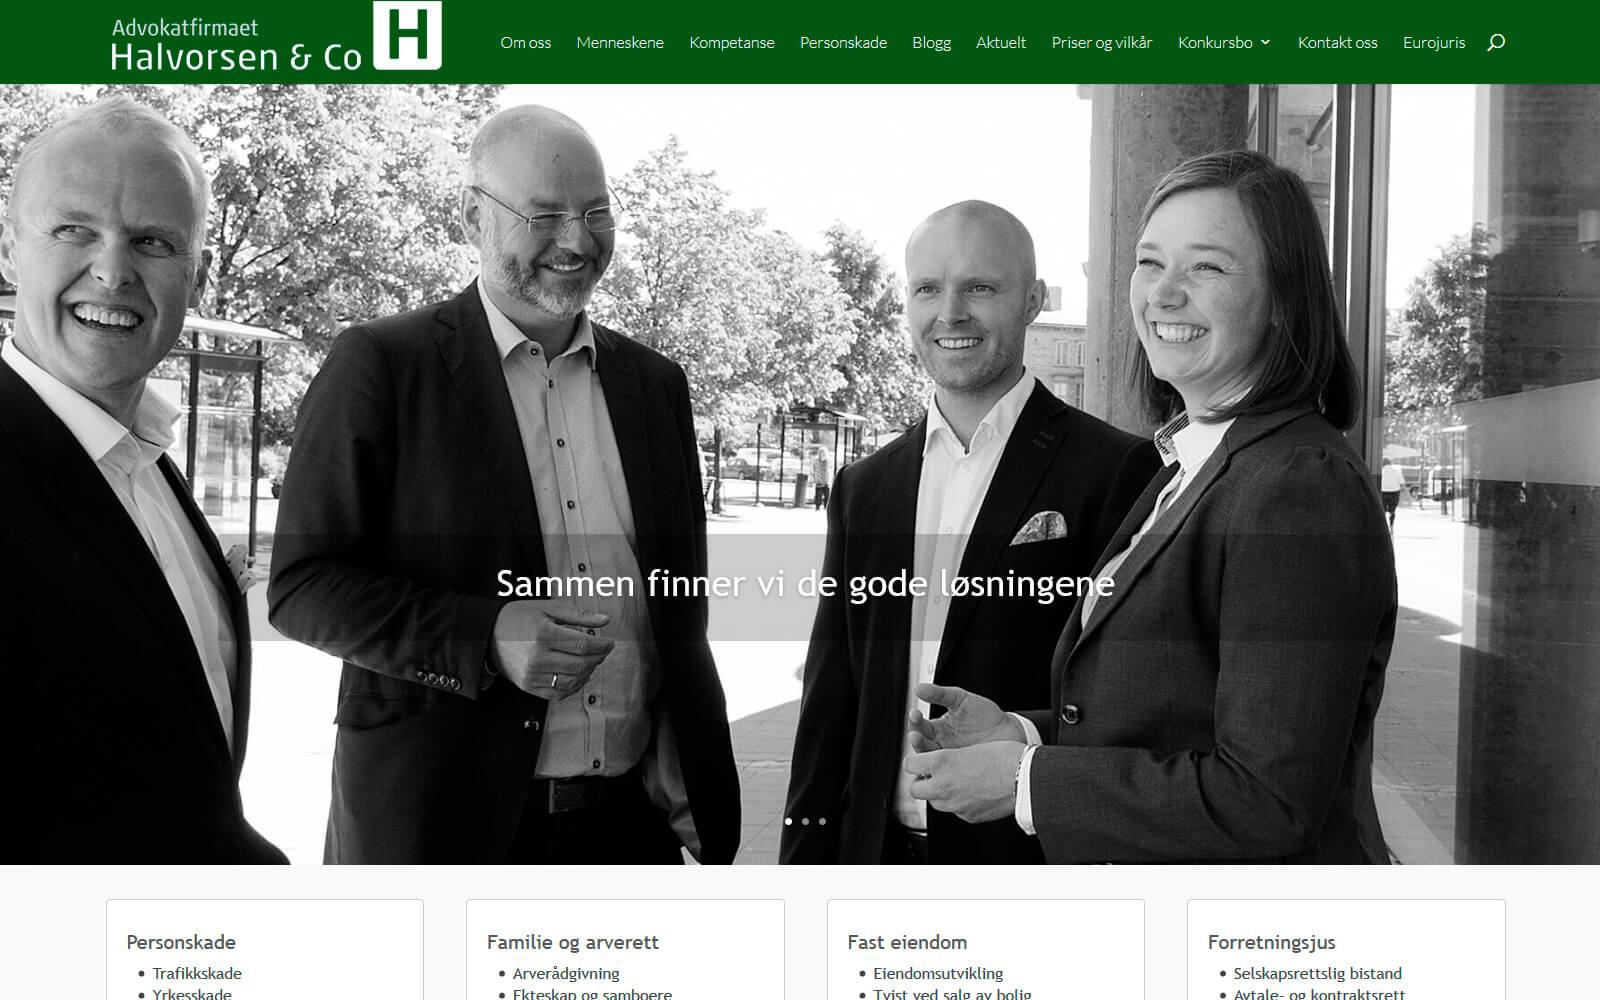 Advokatfirmaet Halvorsen & Co webside